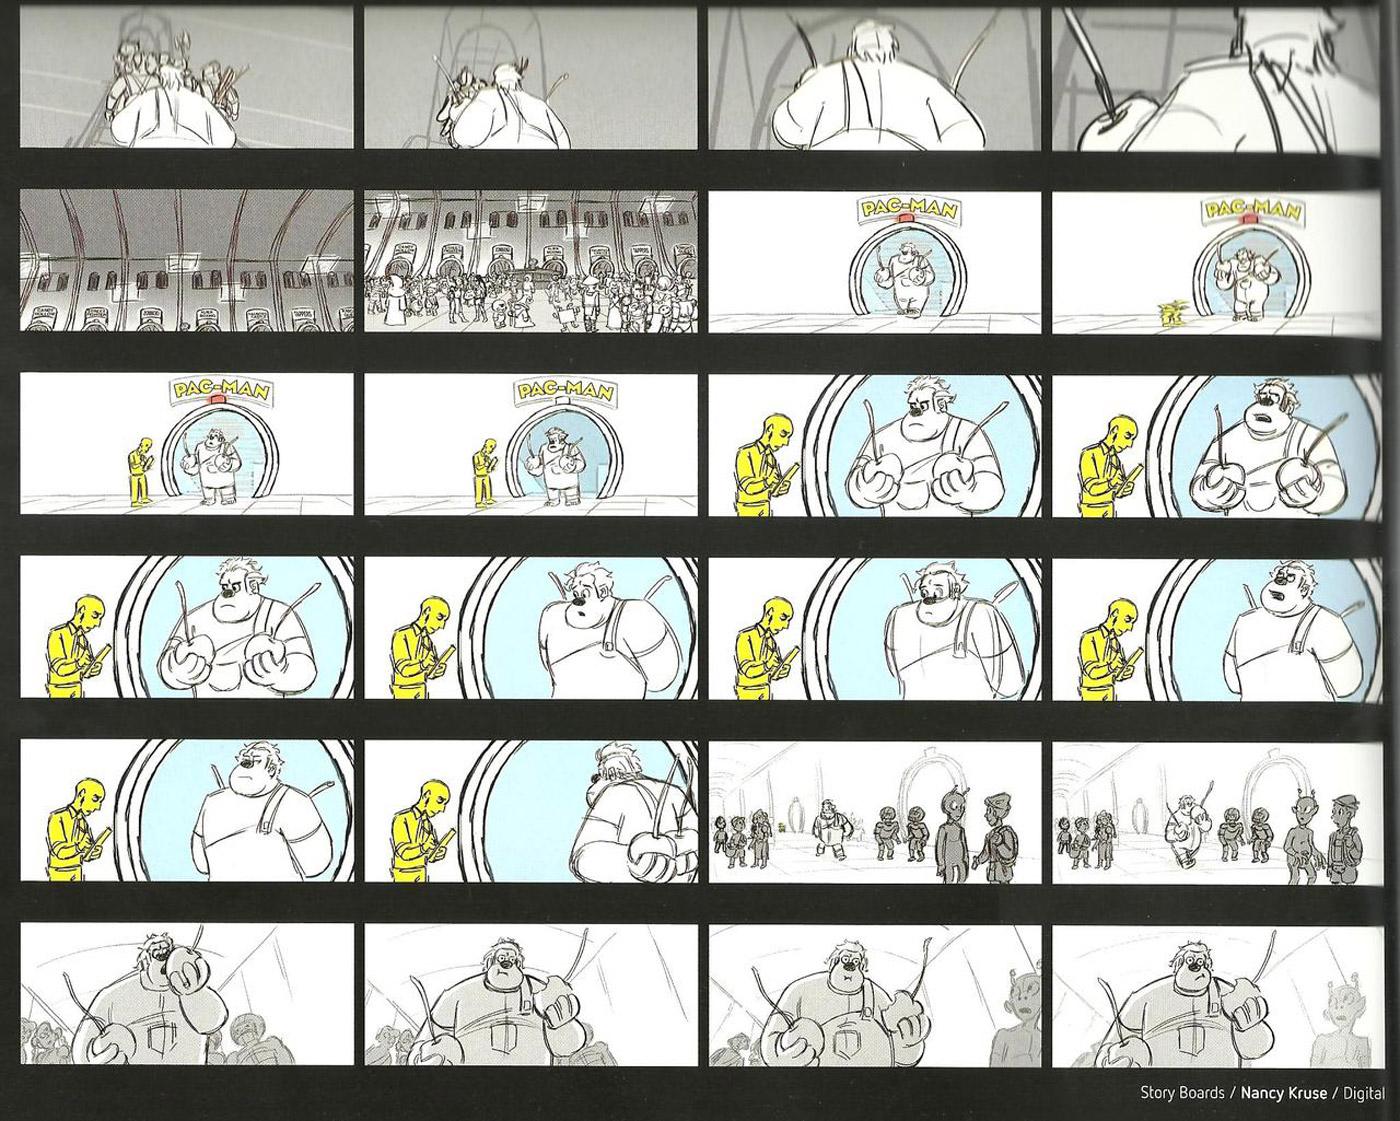 24-The-Art-of-Wreck-It-Ralph-Storyboards-nancy-kruse.jpg